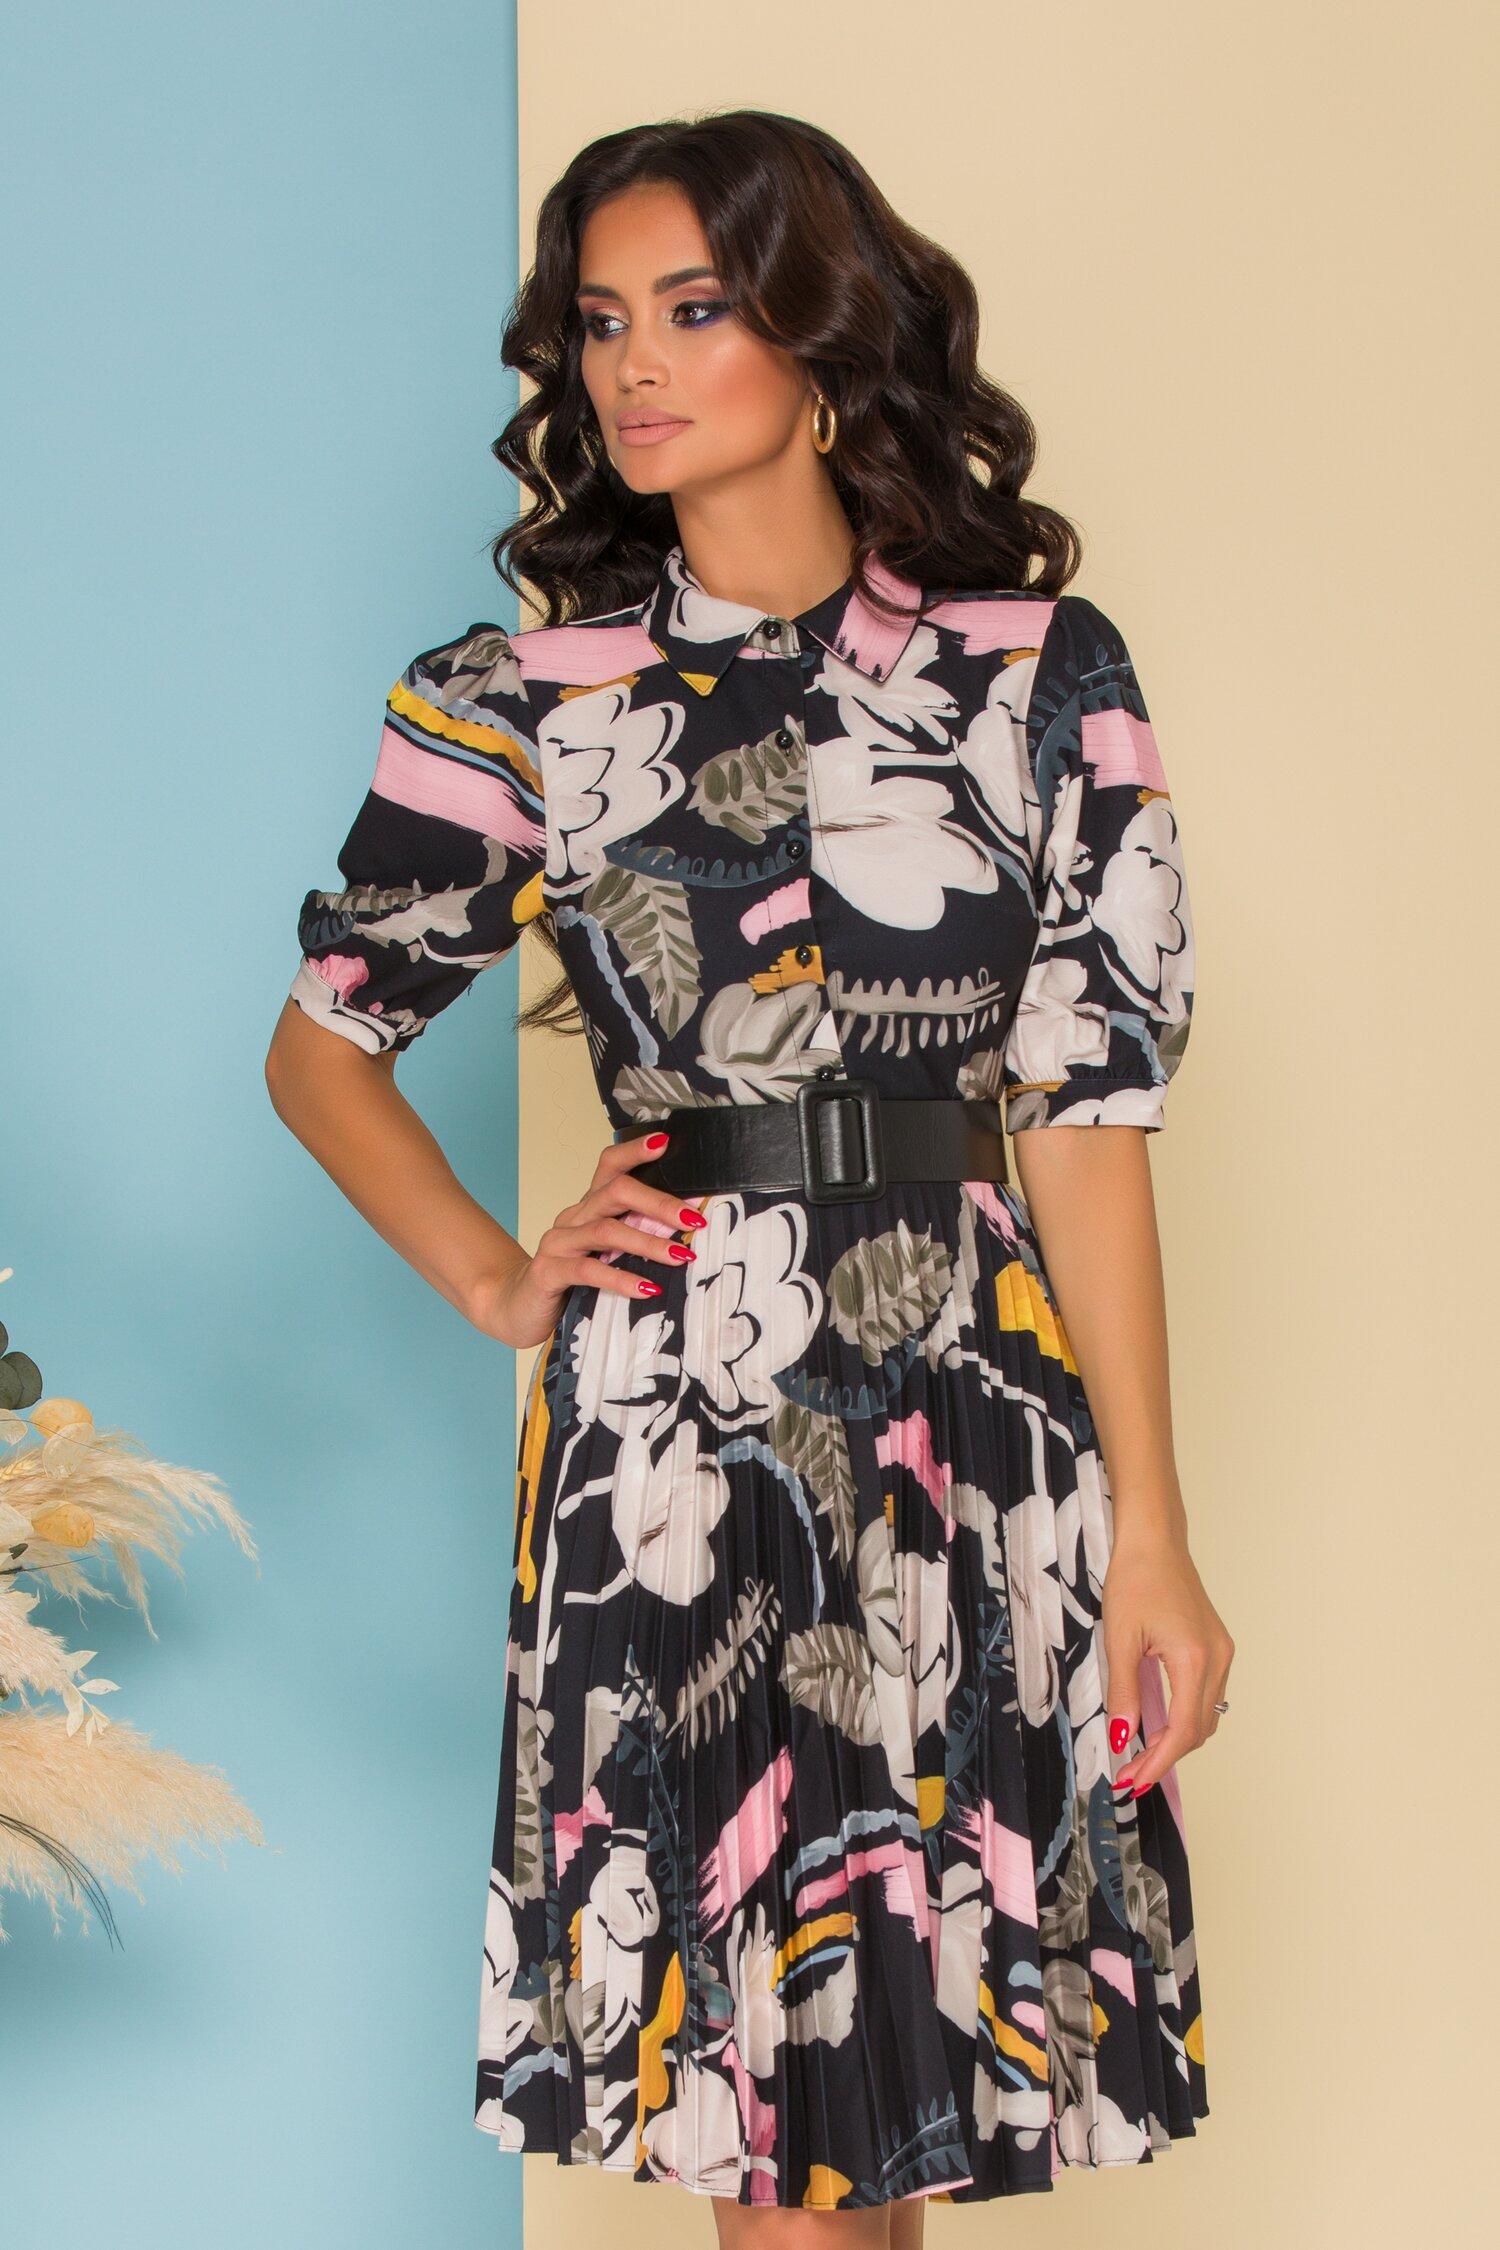 Rochie Larissa neagra cu imprimeu floral si fusta plisata